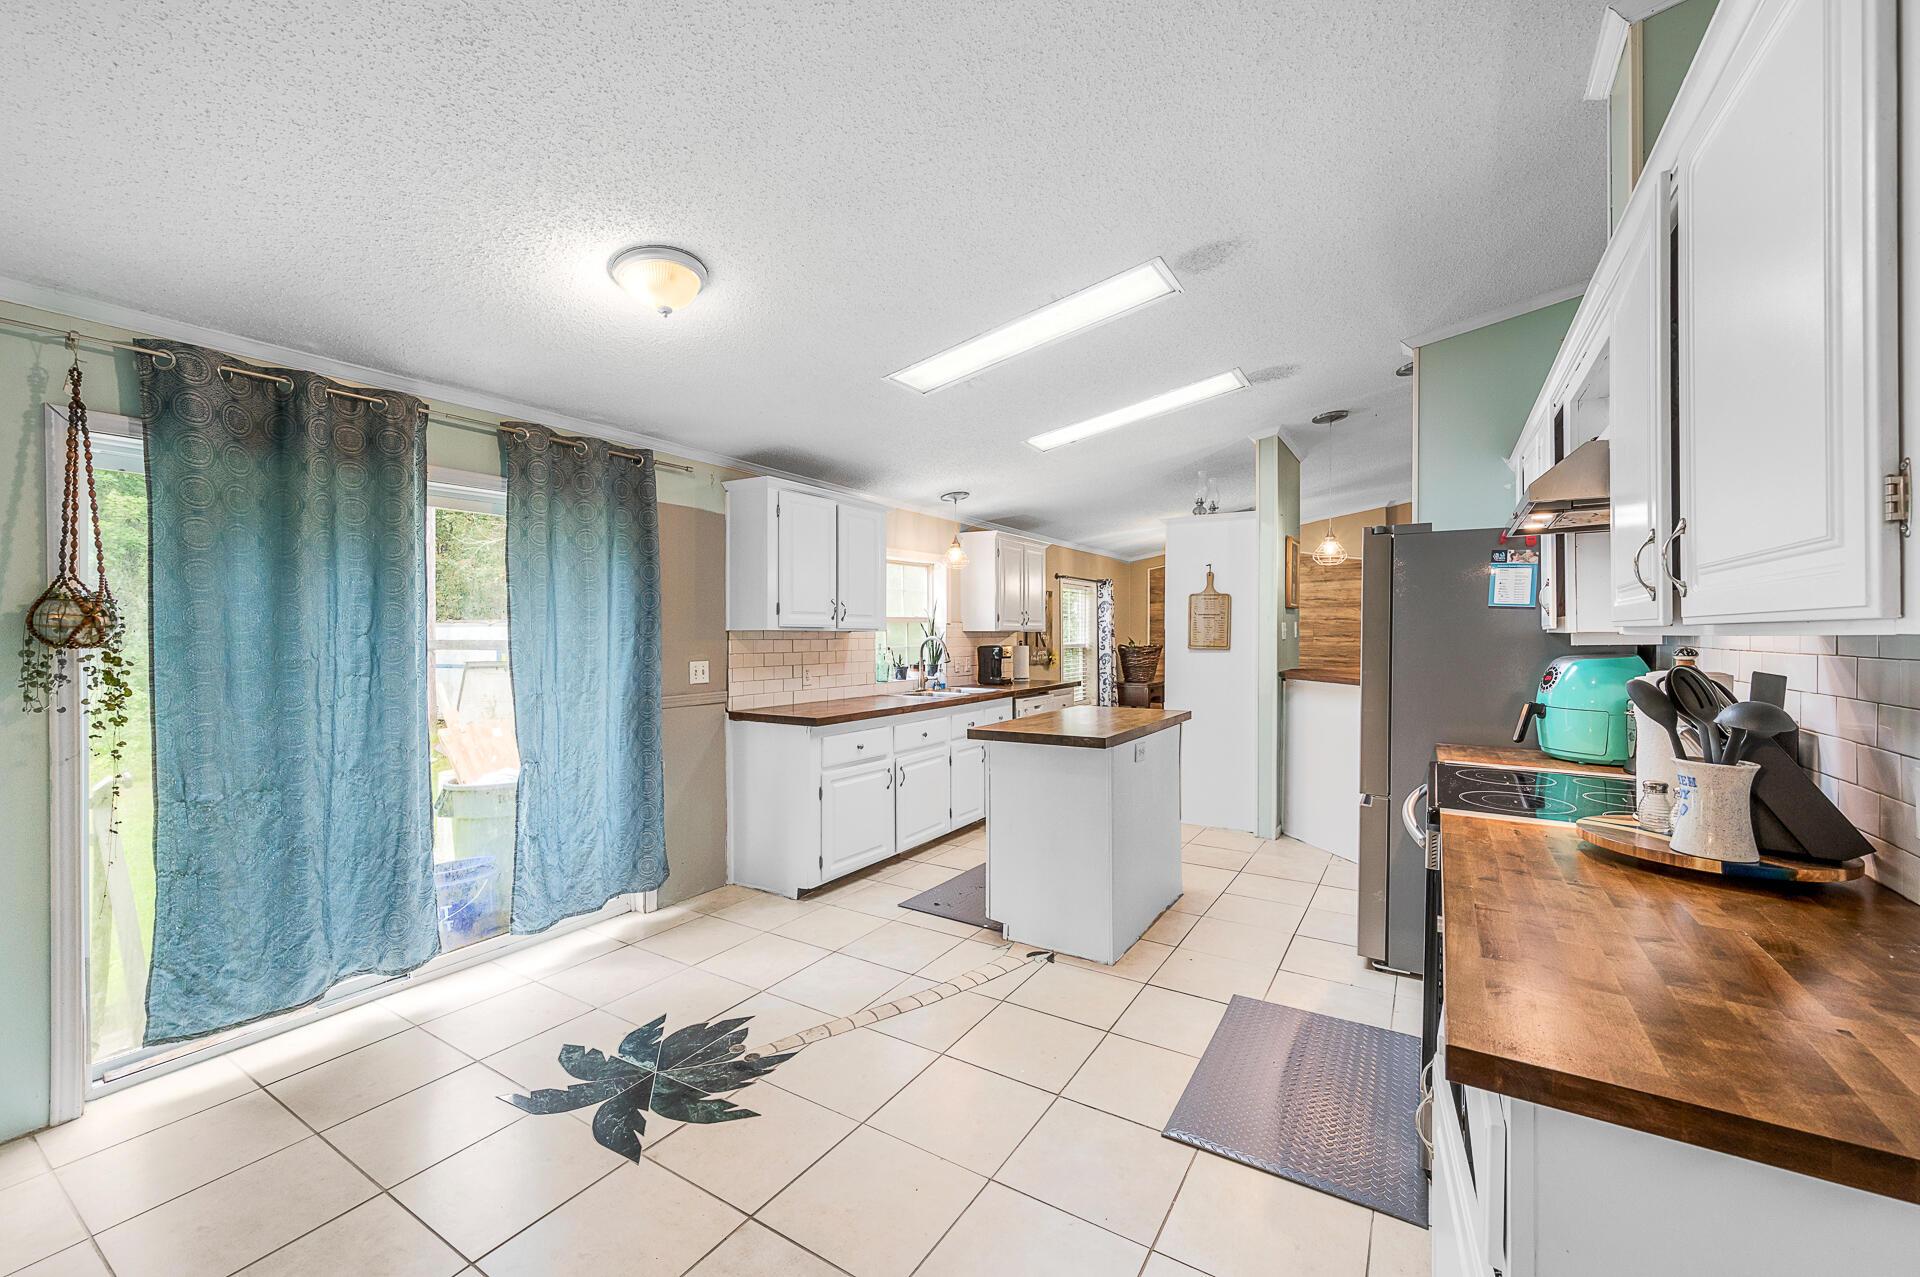 Clemson Terrace Homes For Sale - 250 Medina, Summerville, SC - 19